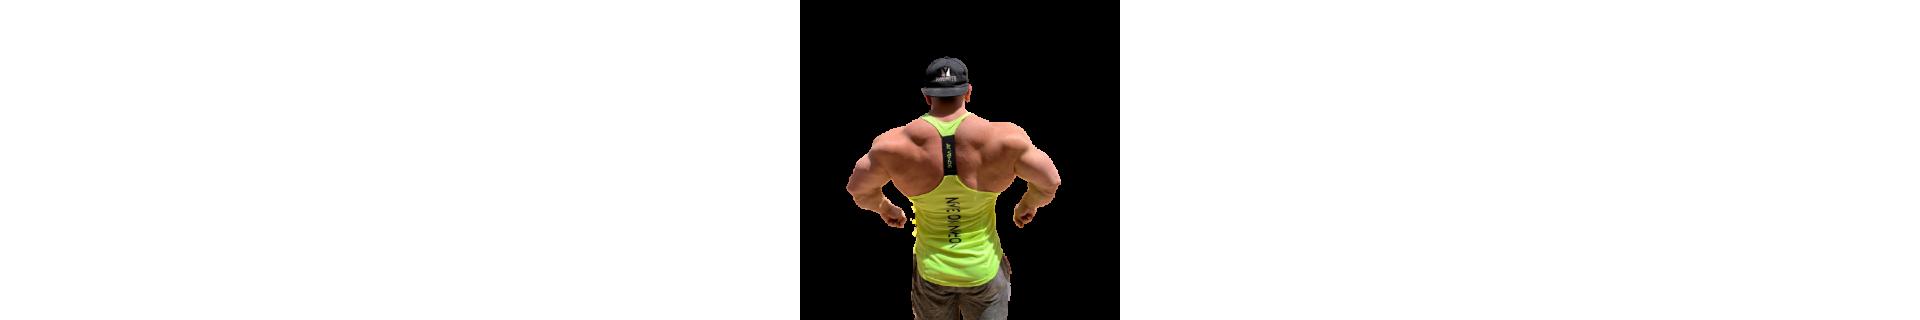 sports clothing man